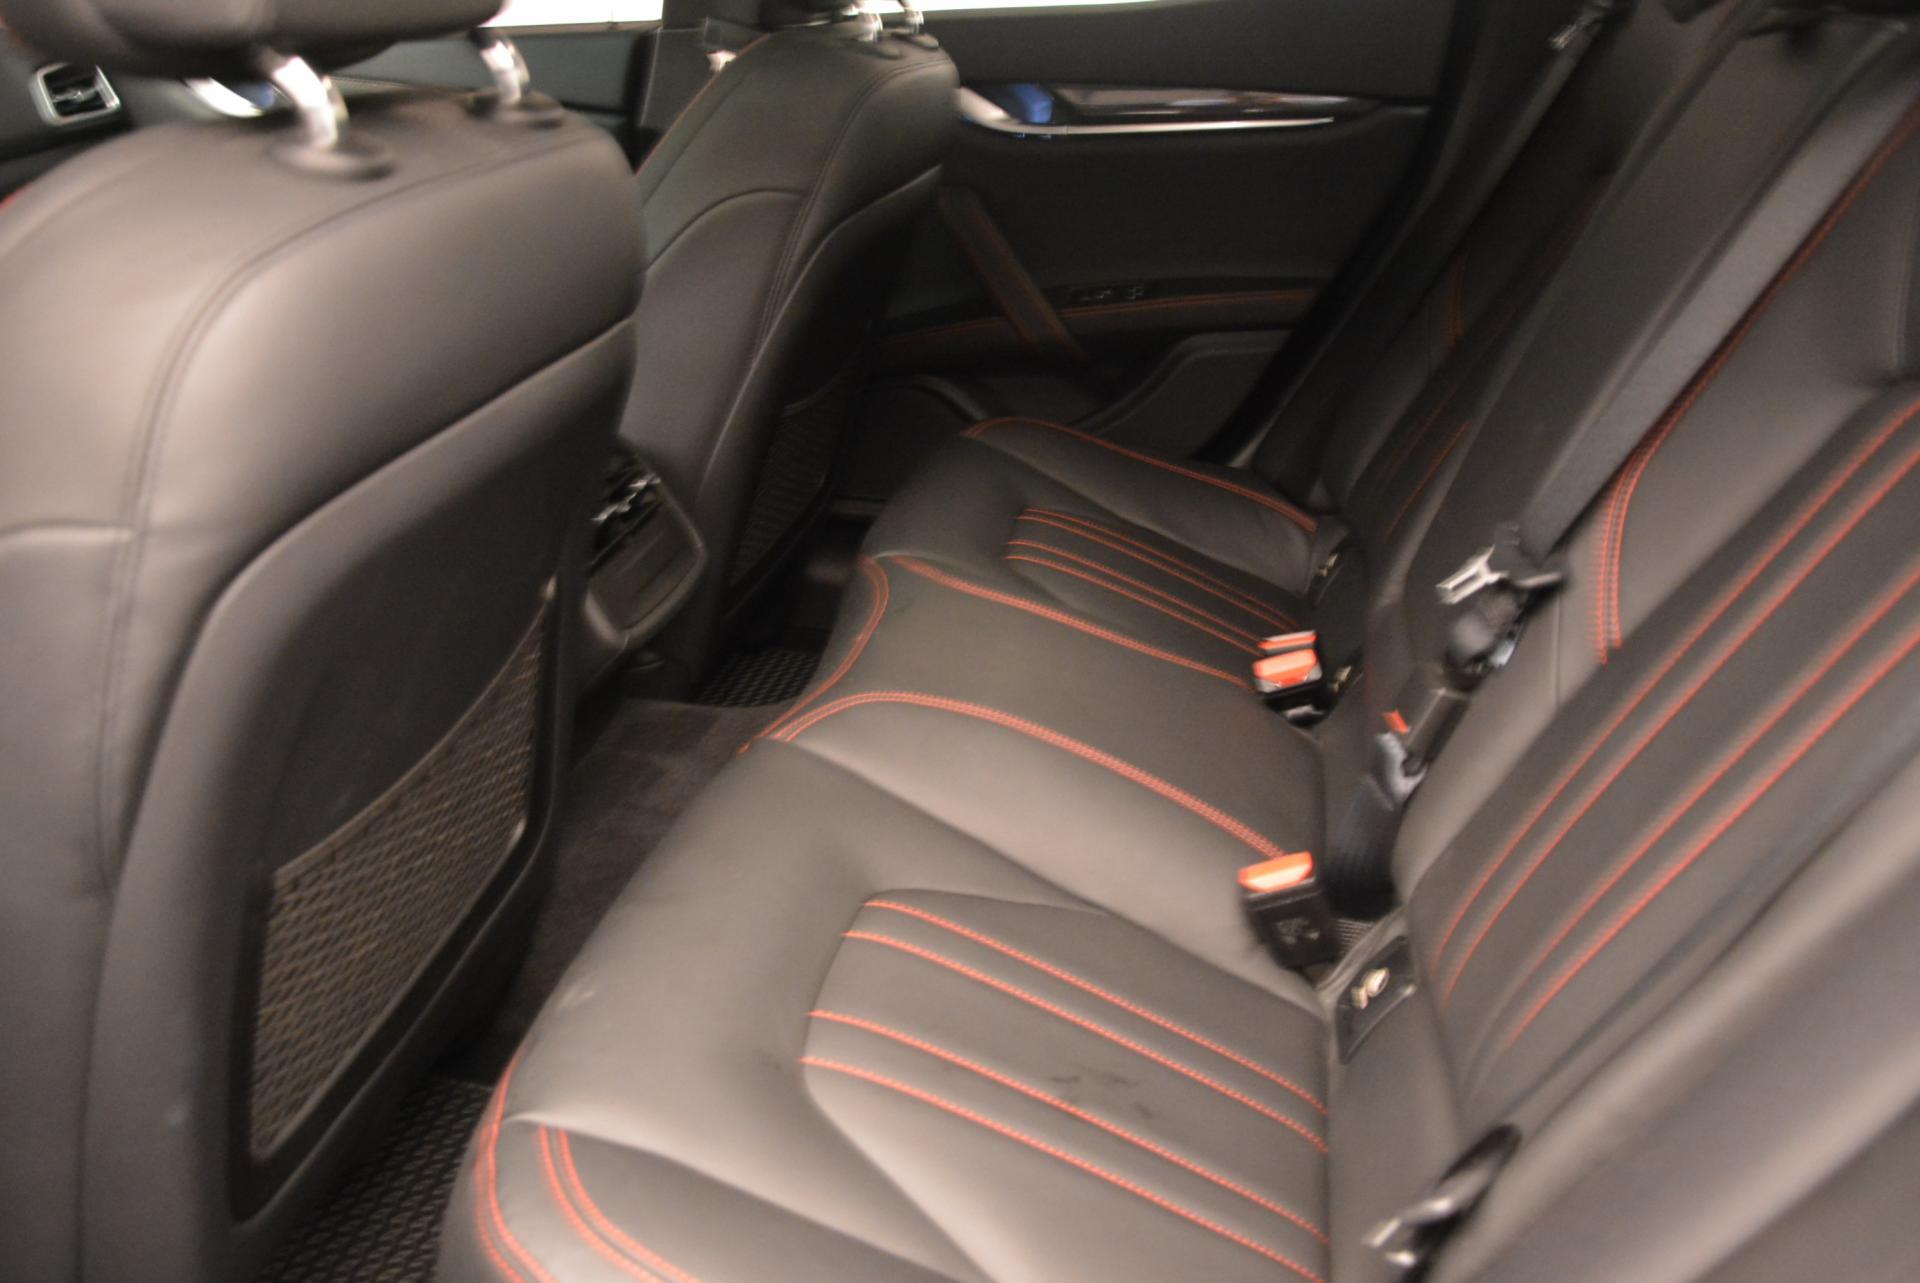 Used 2015 Maserati Ghibli S Q4 For Sale In Westport, CT 117_p16